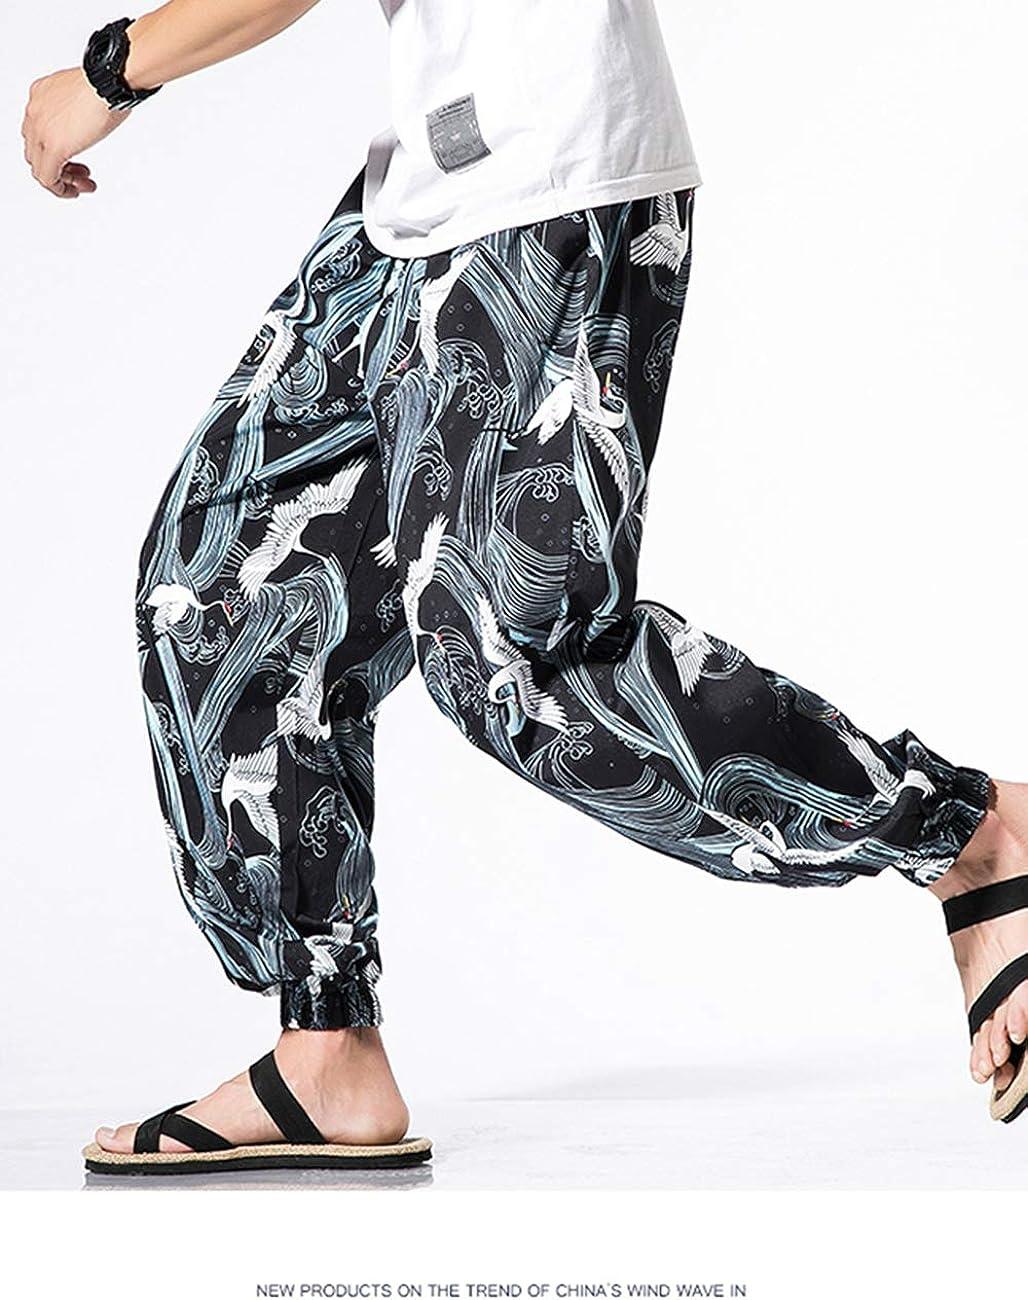 besbomig Pantaloni Aladino Harem Pantaloni Uomo Baggy Hippie Pantaloni Larghi a Cavallo Basso con Tasche Great Comfort